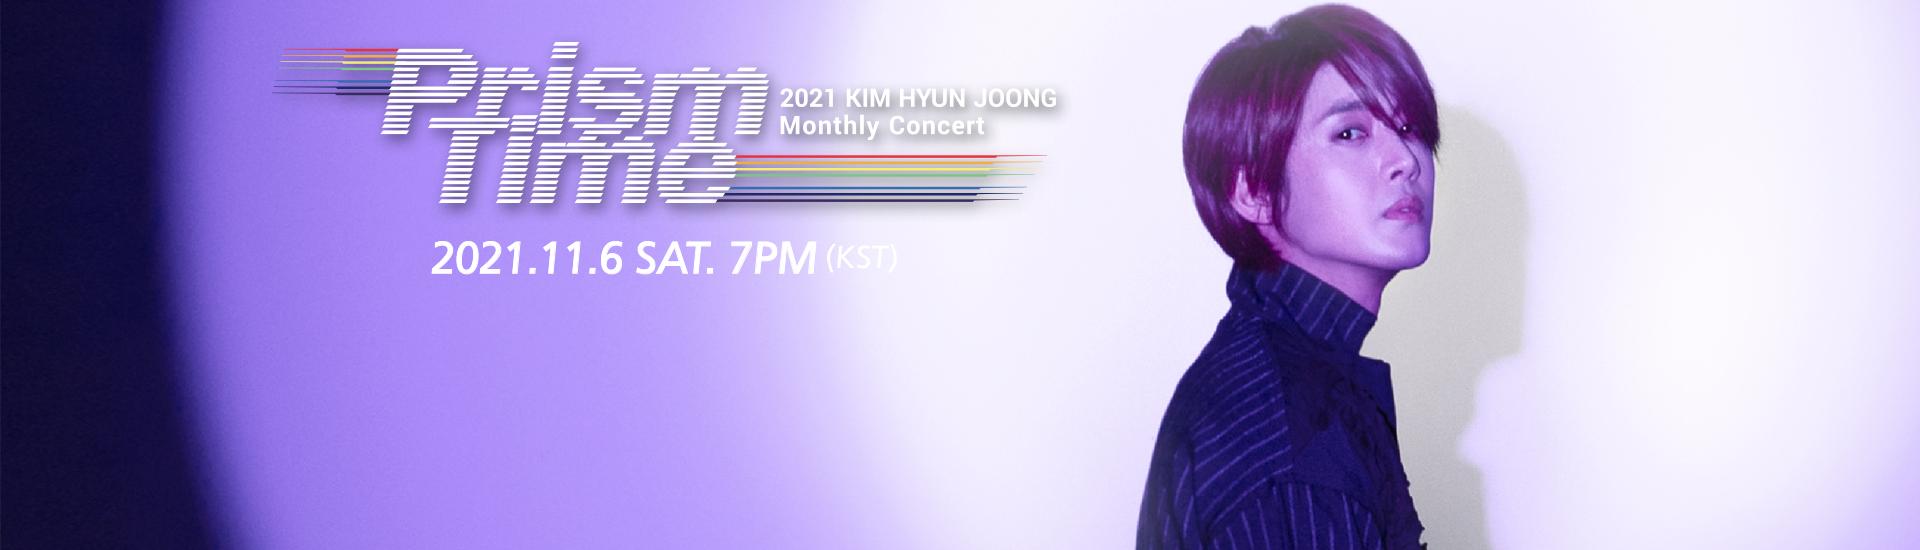 Kim Hyun Joong - KIM HYUN JOONG Monthly Concert 'Prism Time' [Violet]